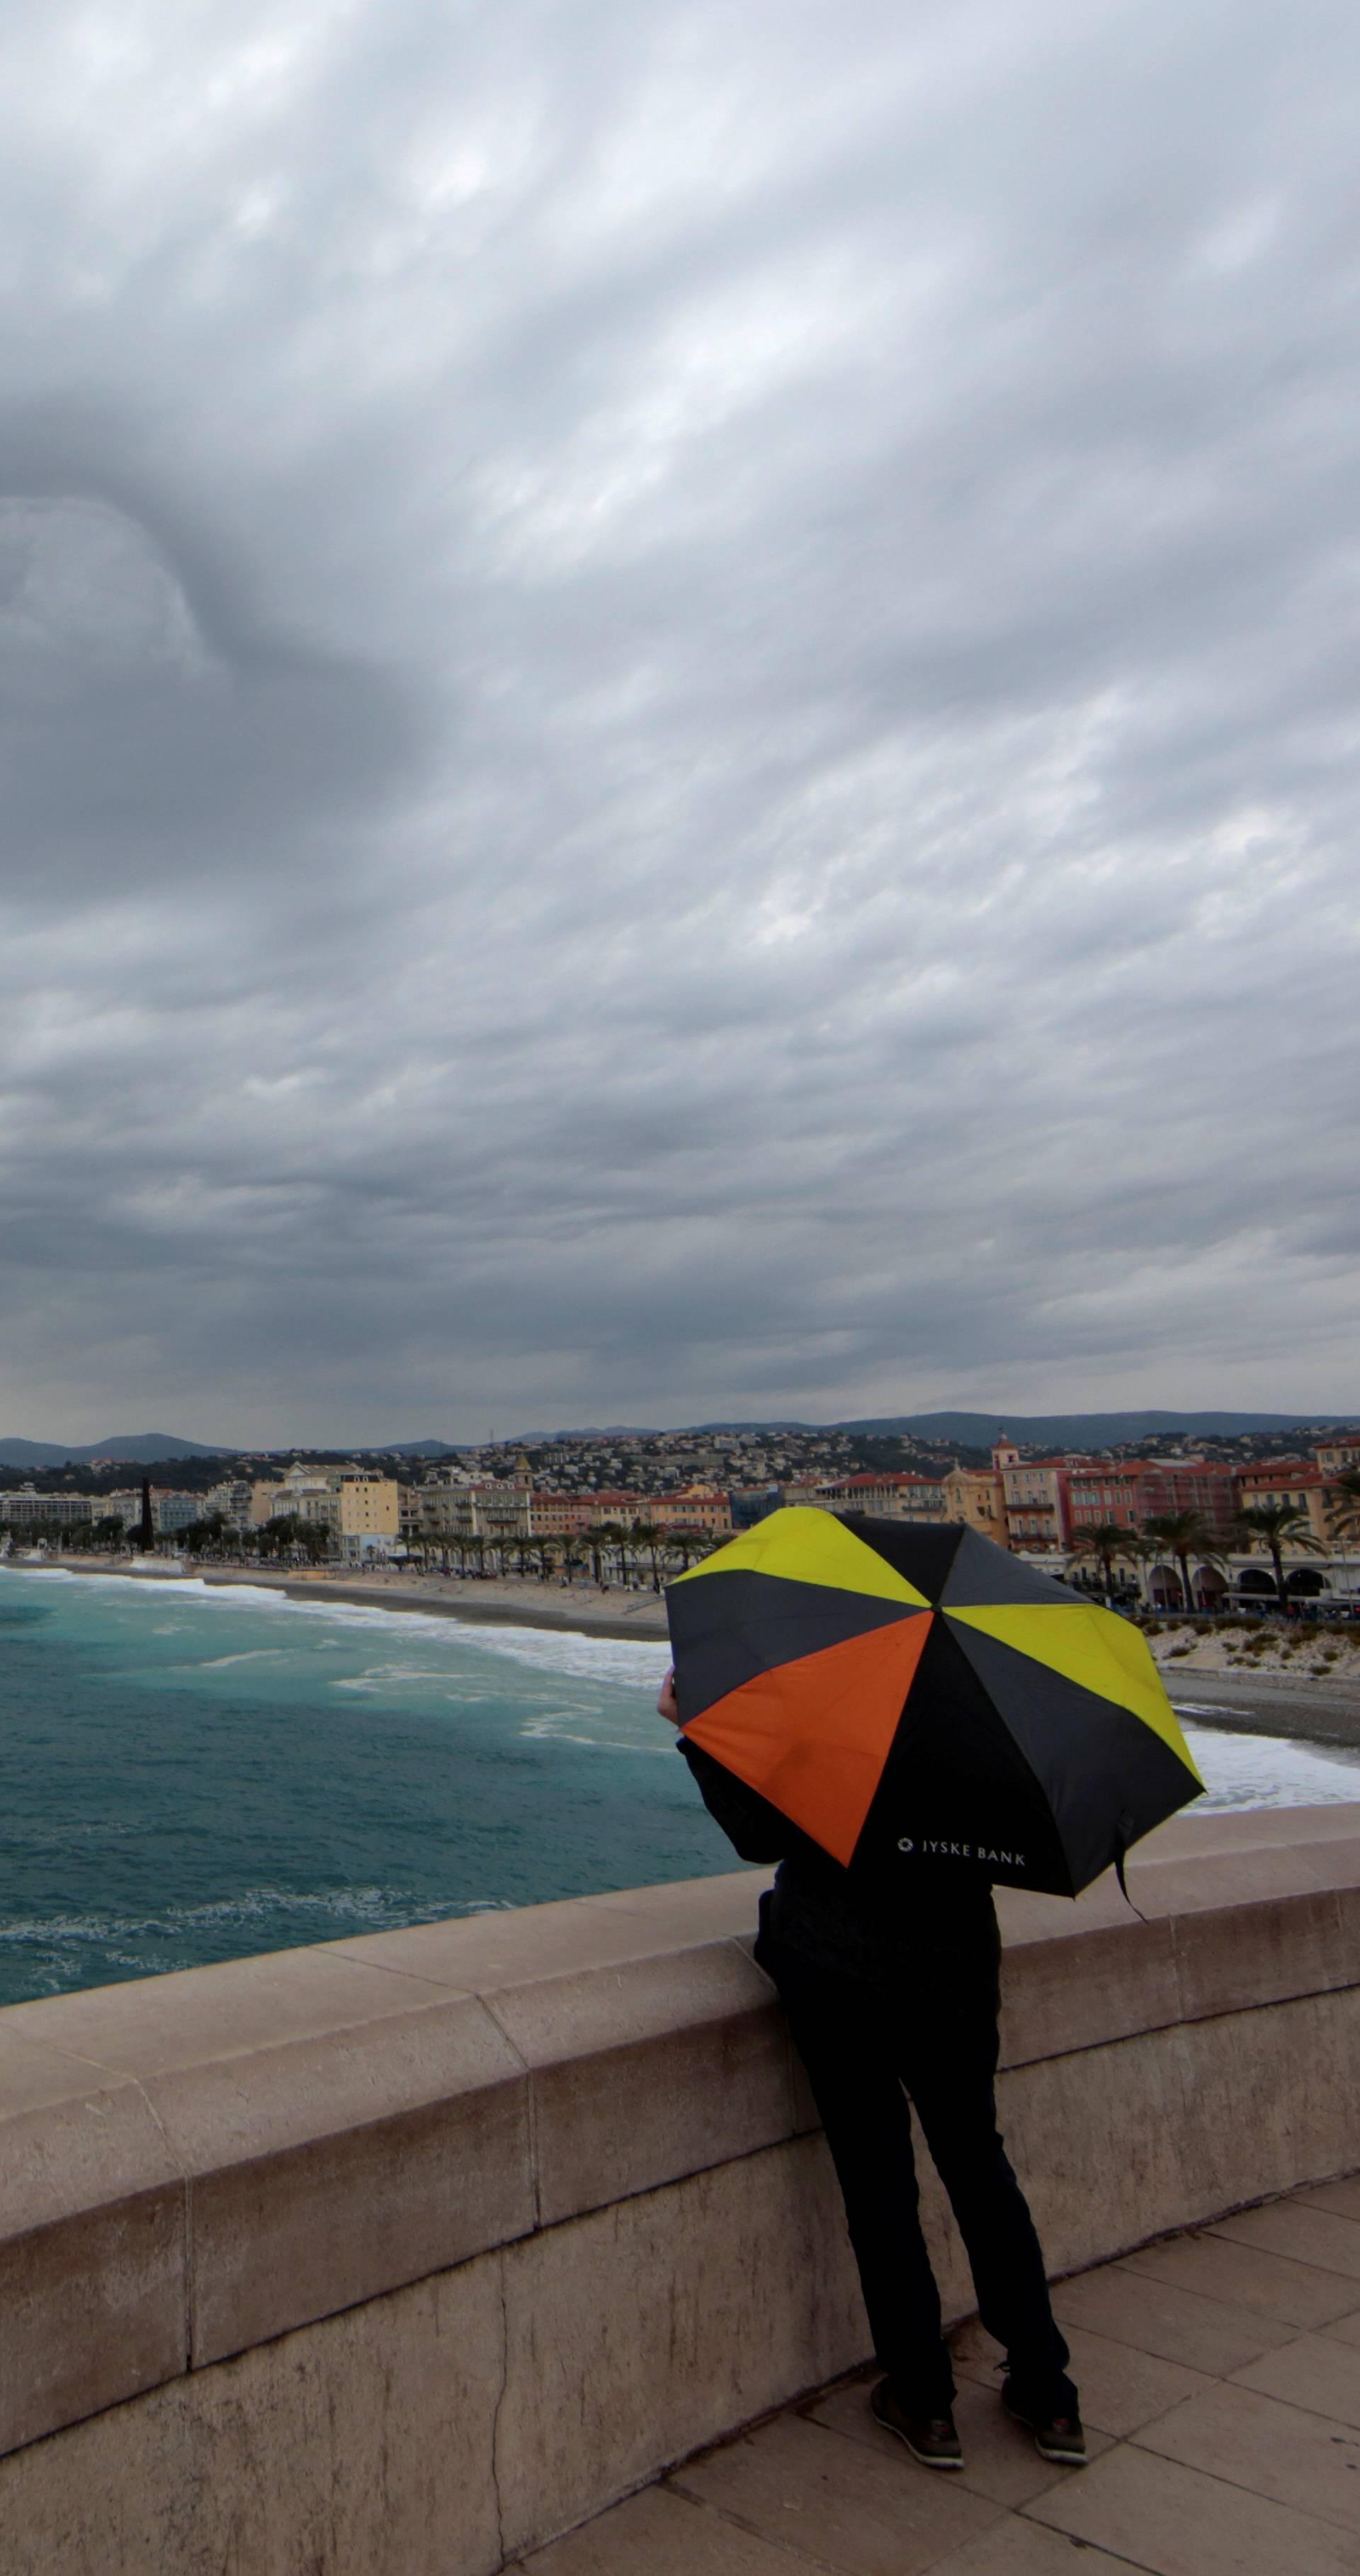 Meteoalarm za cijeli Jadran: 'Čuvajte se, puše olujno jugo'